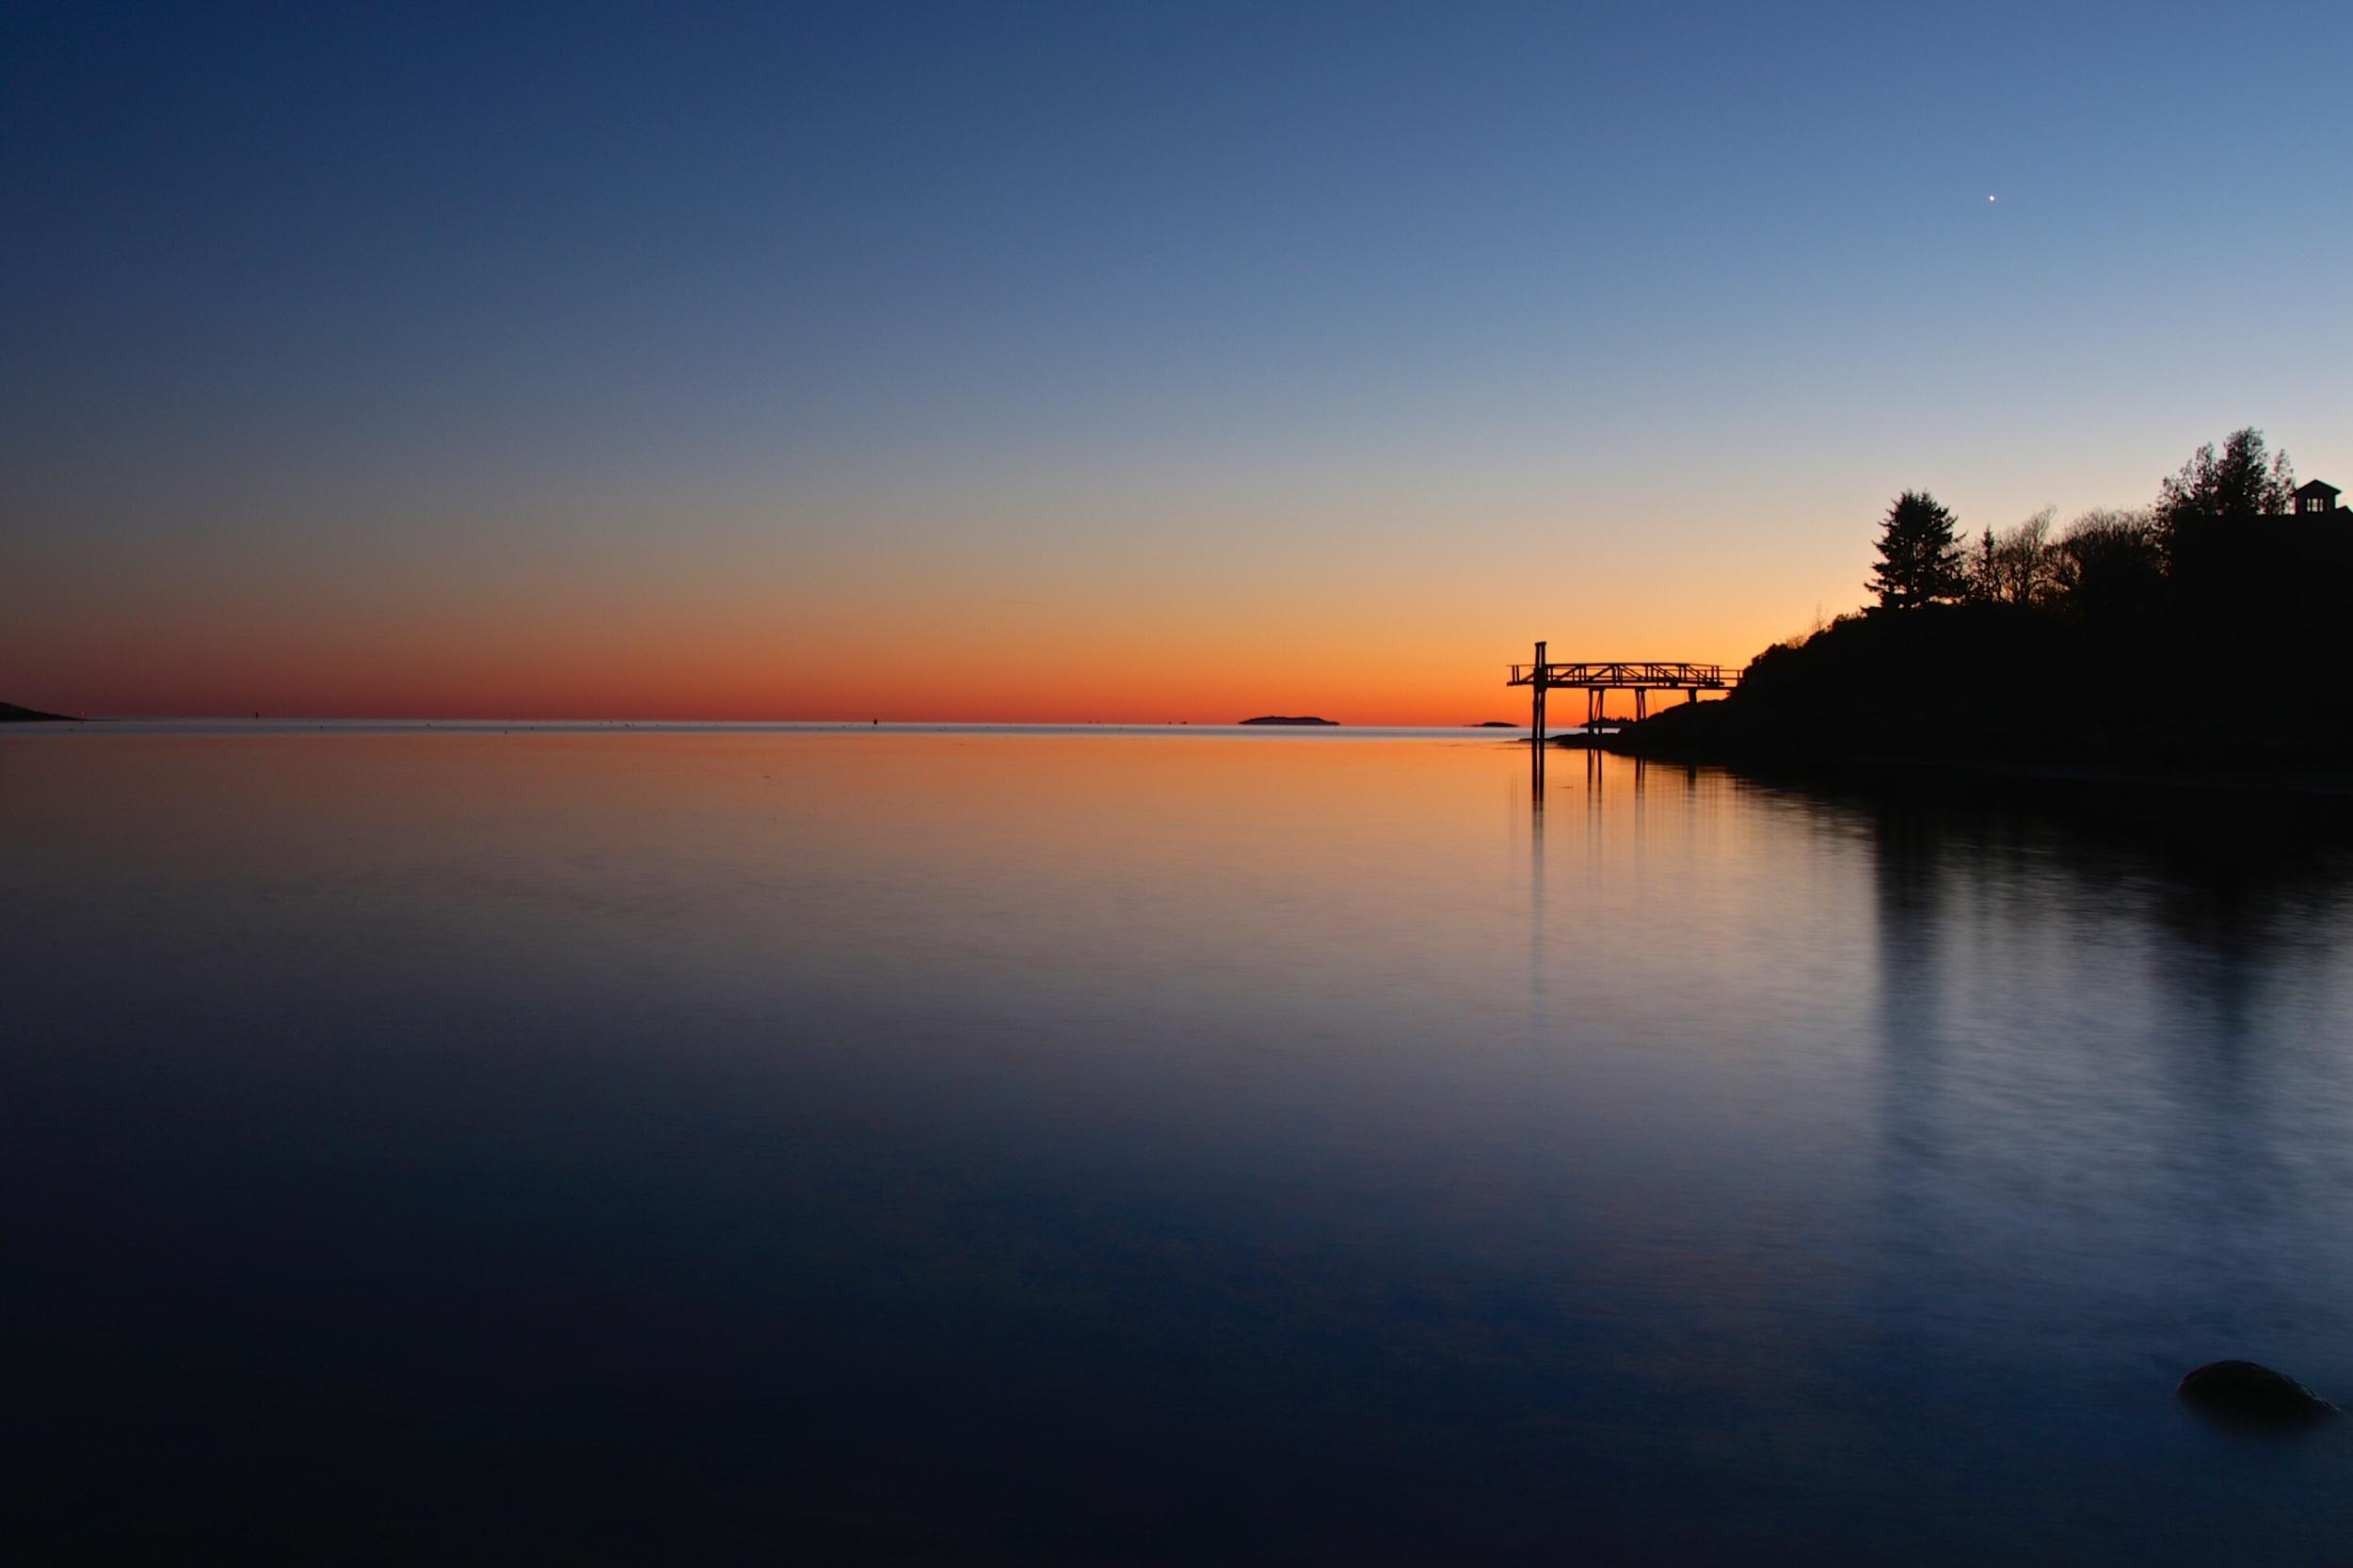 04-southport island:apr.jpeg